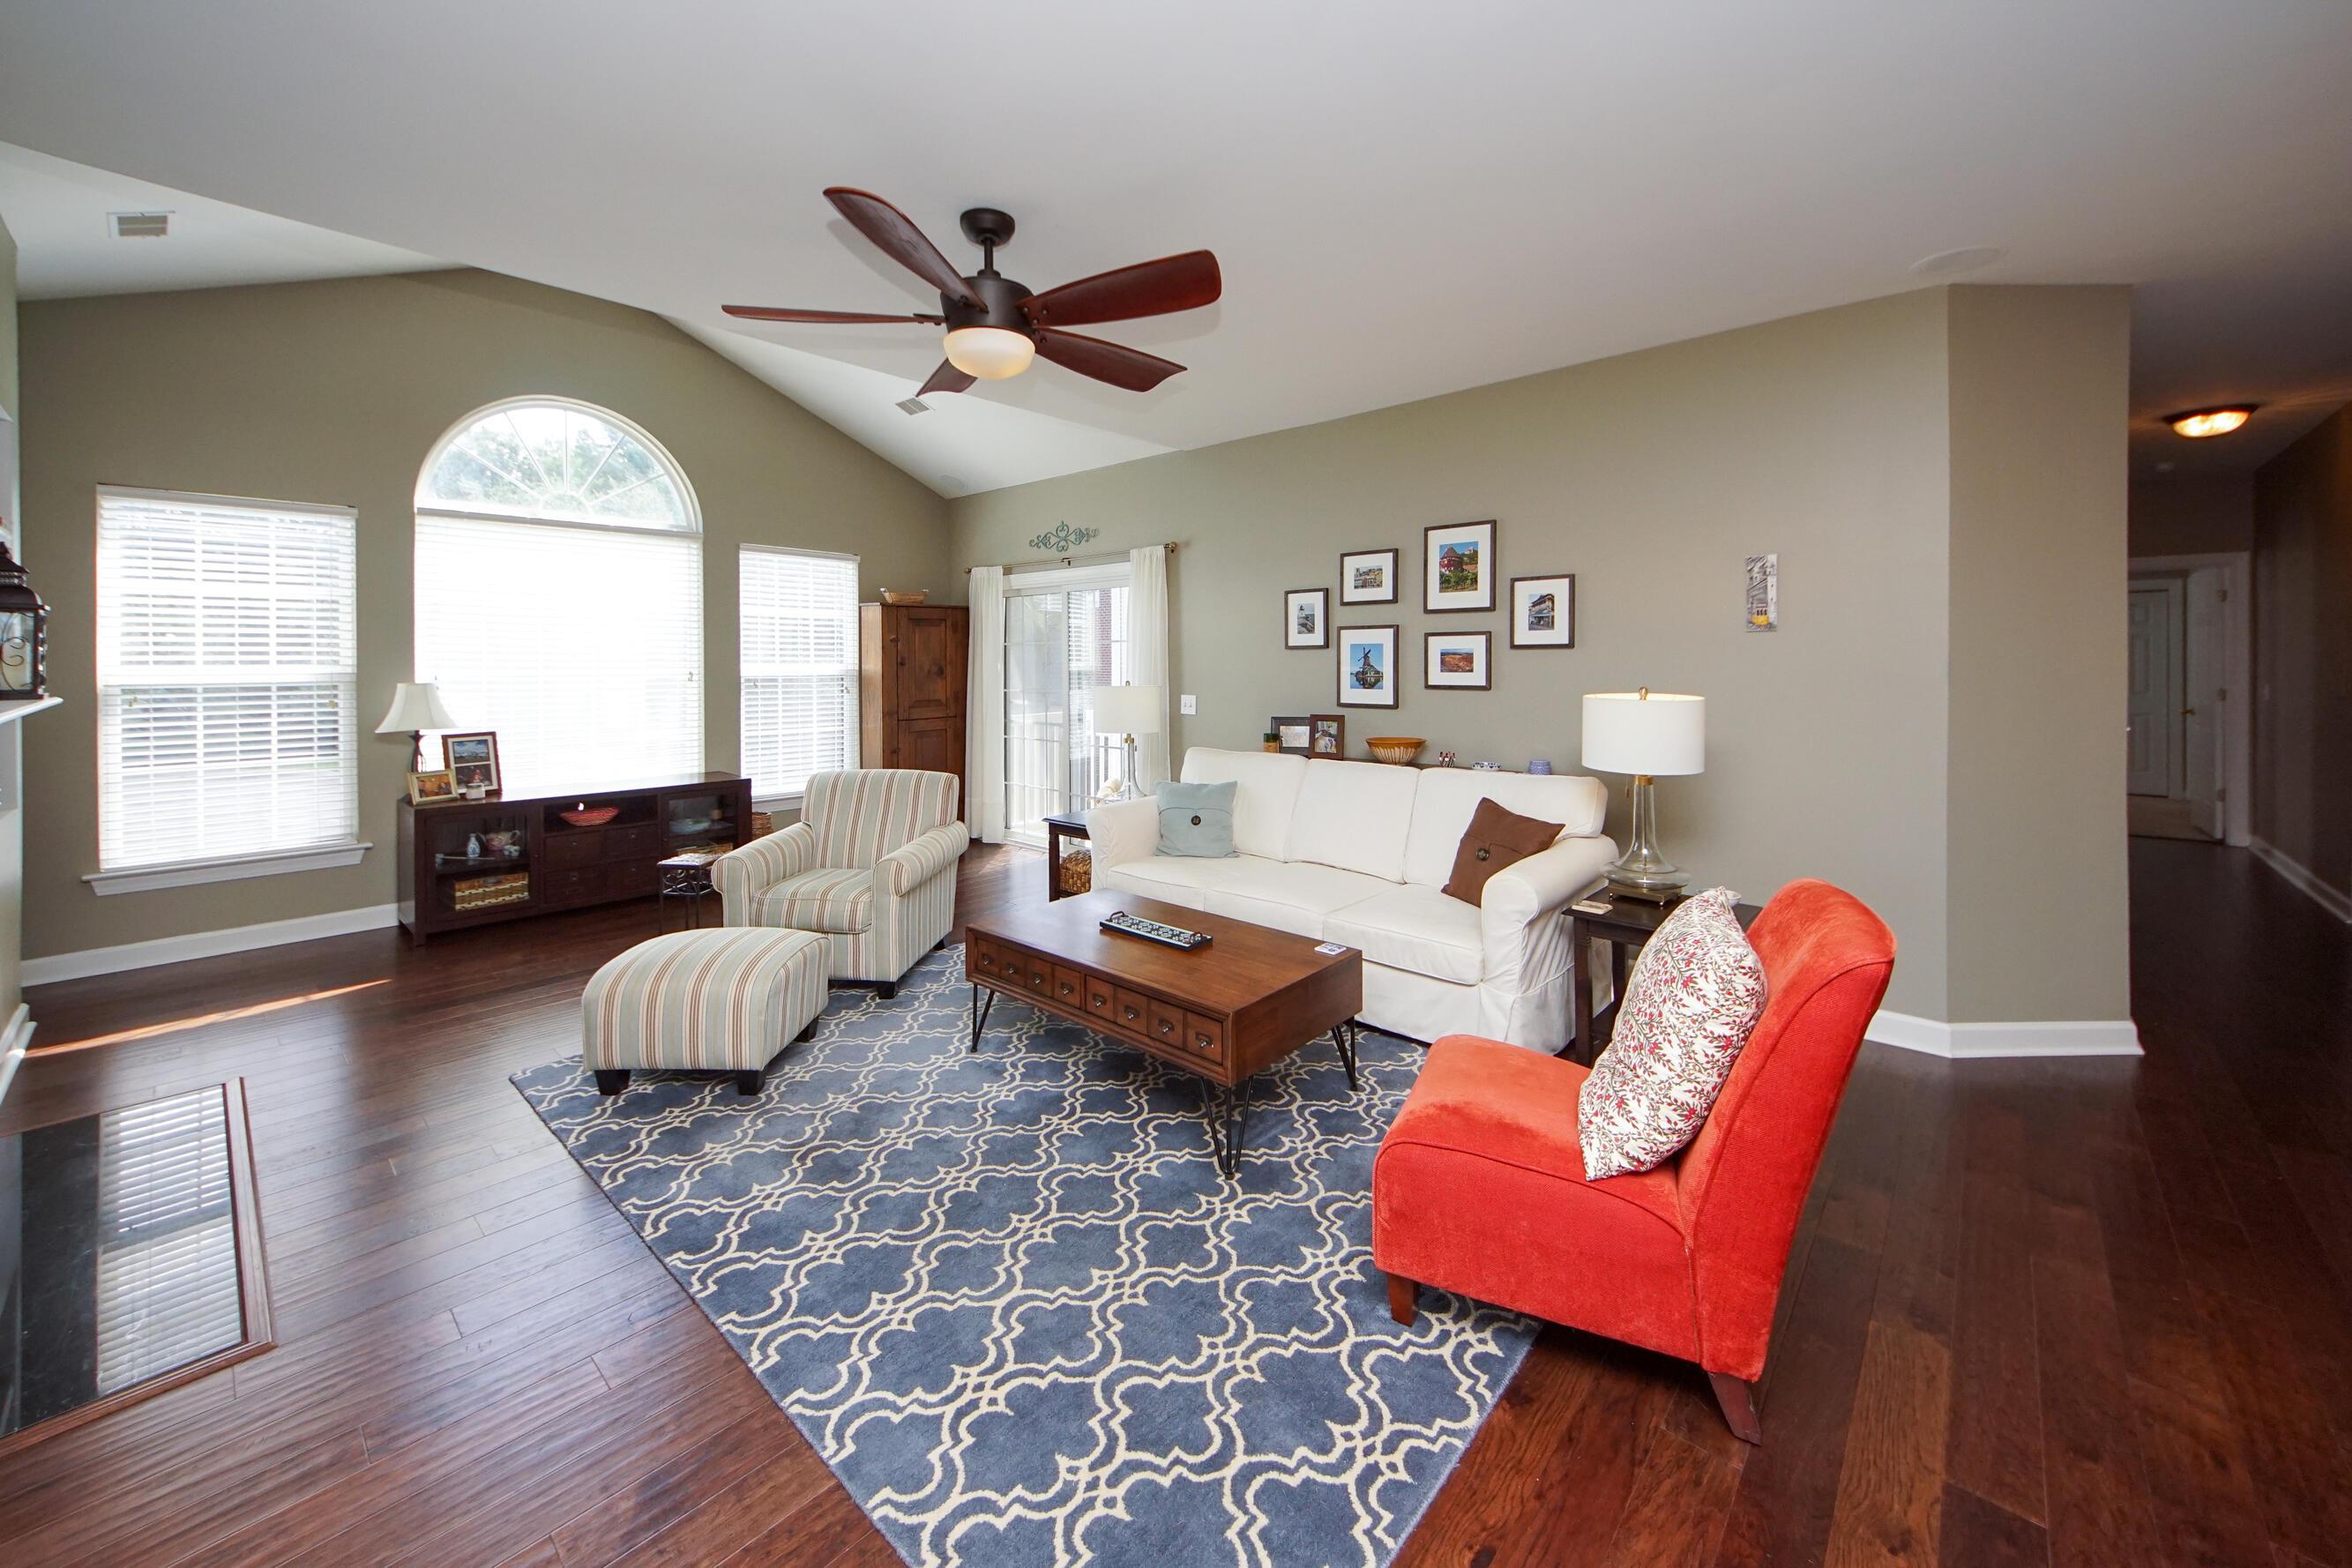 Dunes West Homes For Sale - 1631 Camfield, Mount Pleasant, SC - 10